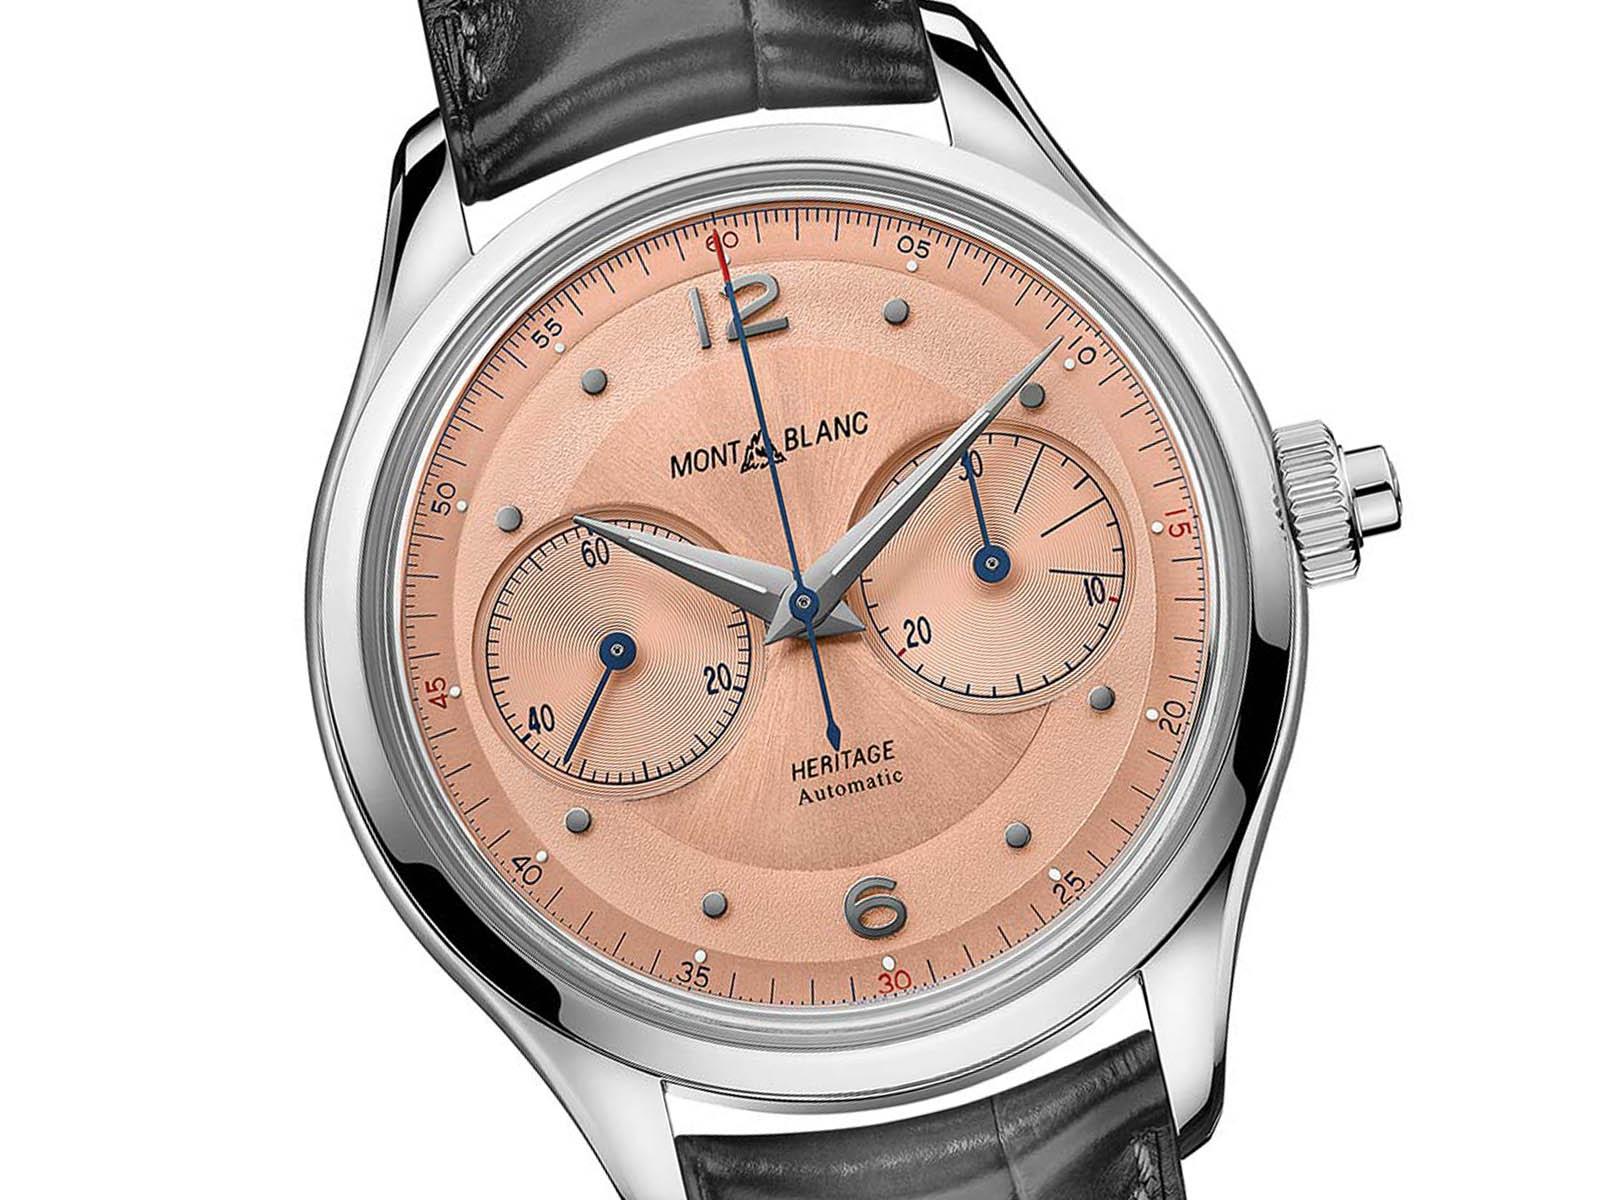 126078-montblanc-heritage-monopusher-chronograph-2.jpg